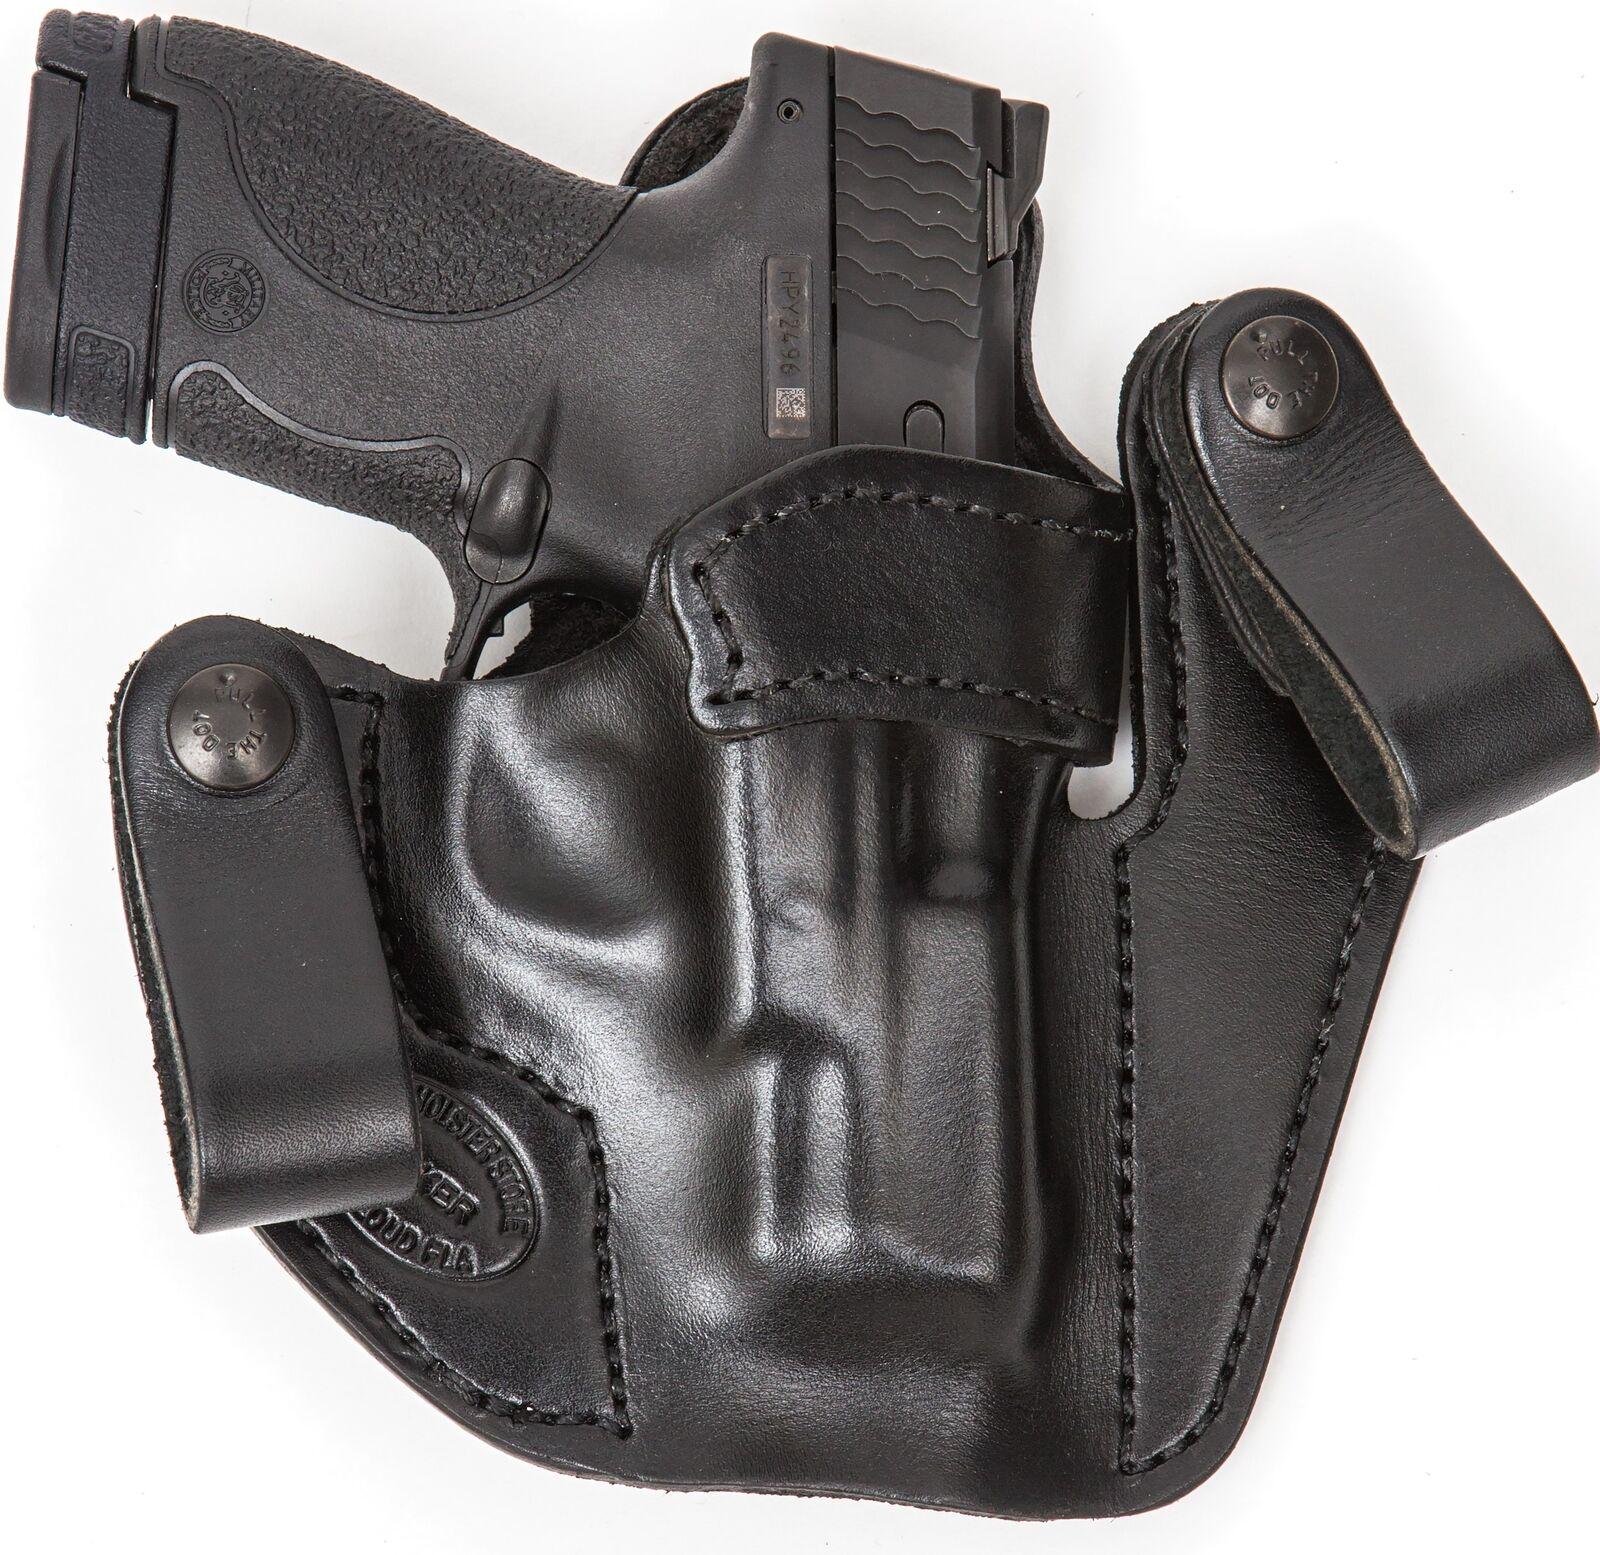 Xtreme llevar RH LH IWB Cuero Funda Pistola Para Colt agente 1911 Modelo